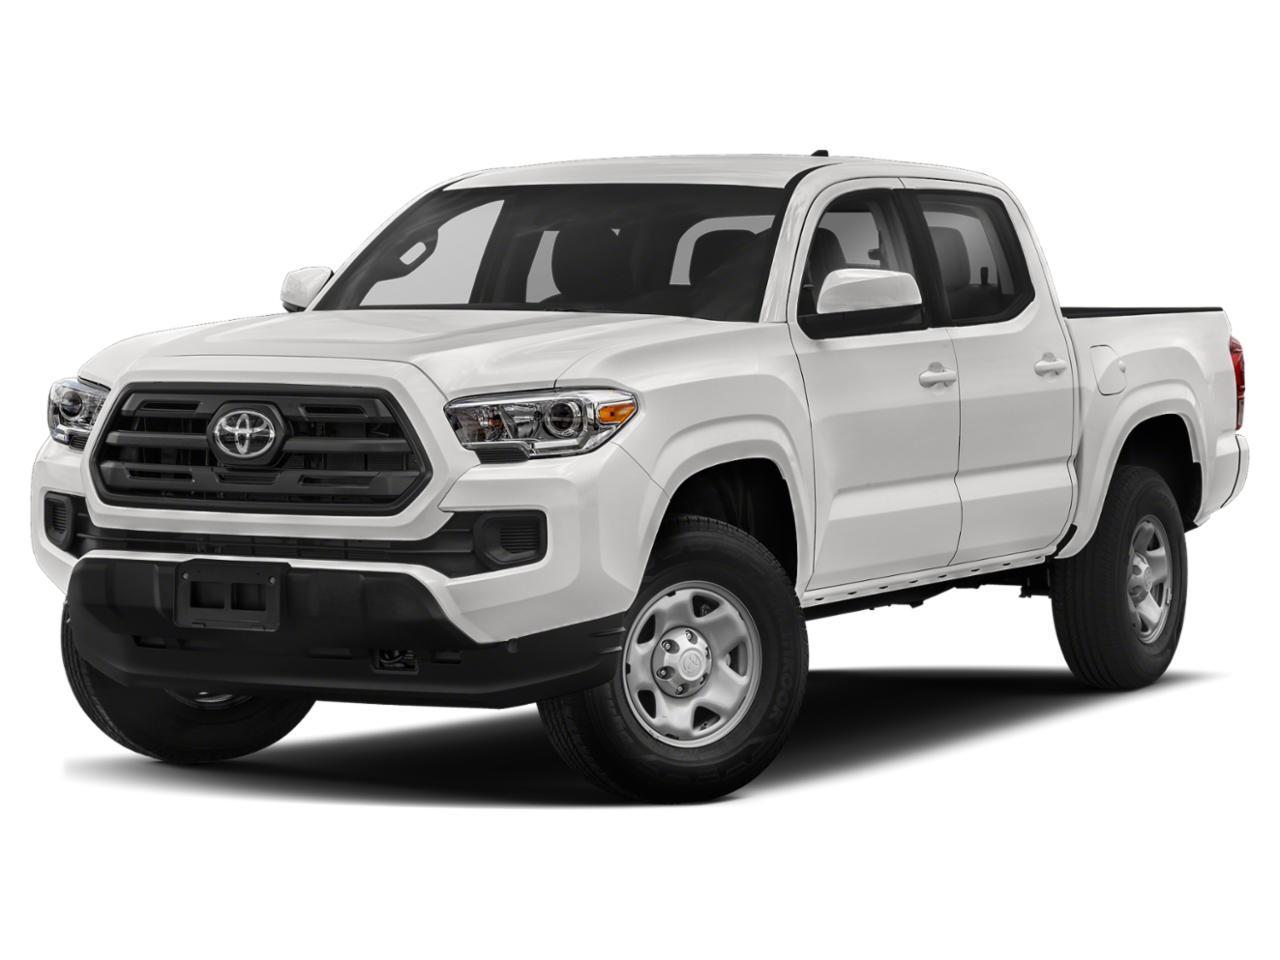 2019 Toyota Tacoma 4WD Vehicle Photo in Baton Rouge, LA 70806